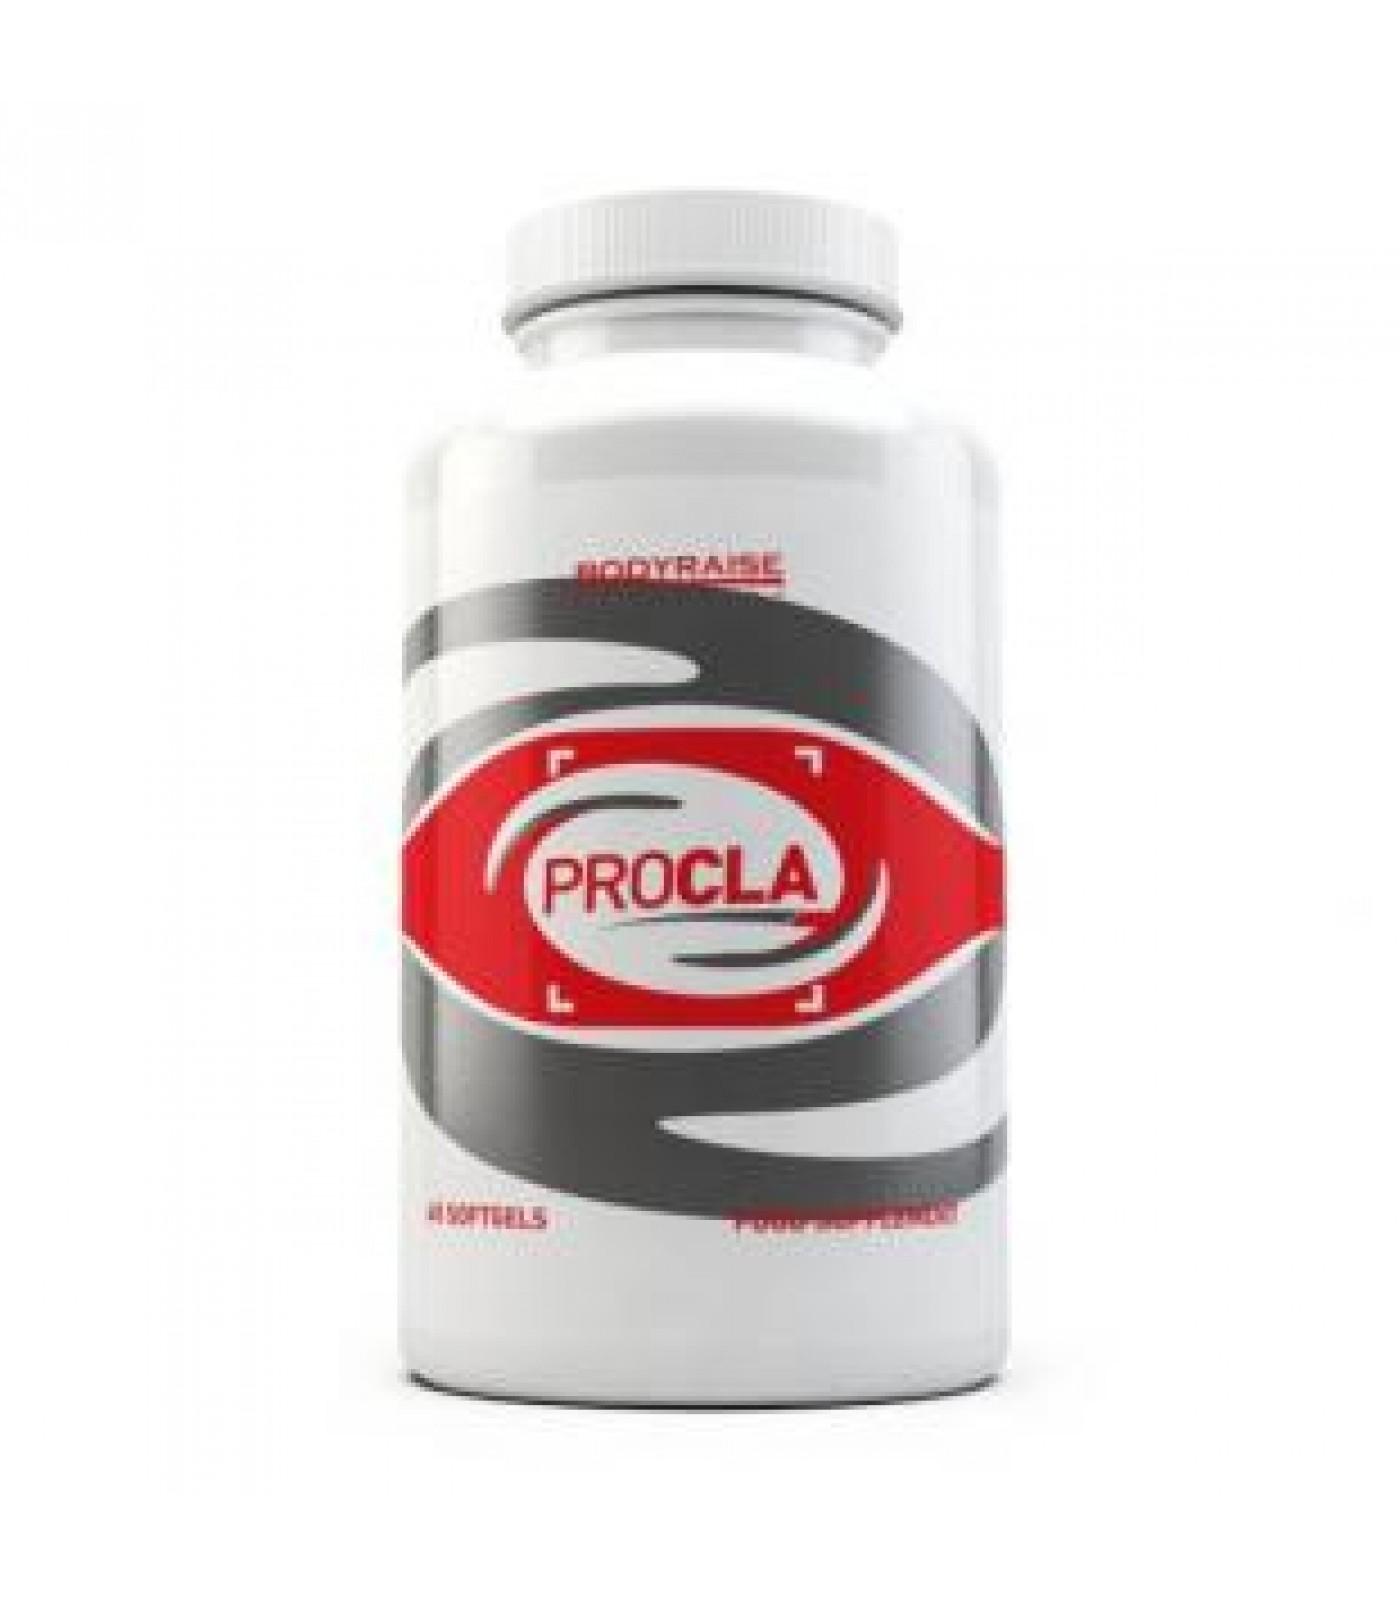 Bodyraise - ProCLA / 60 softgels